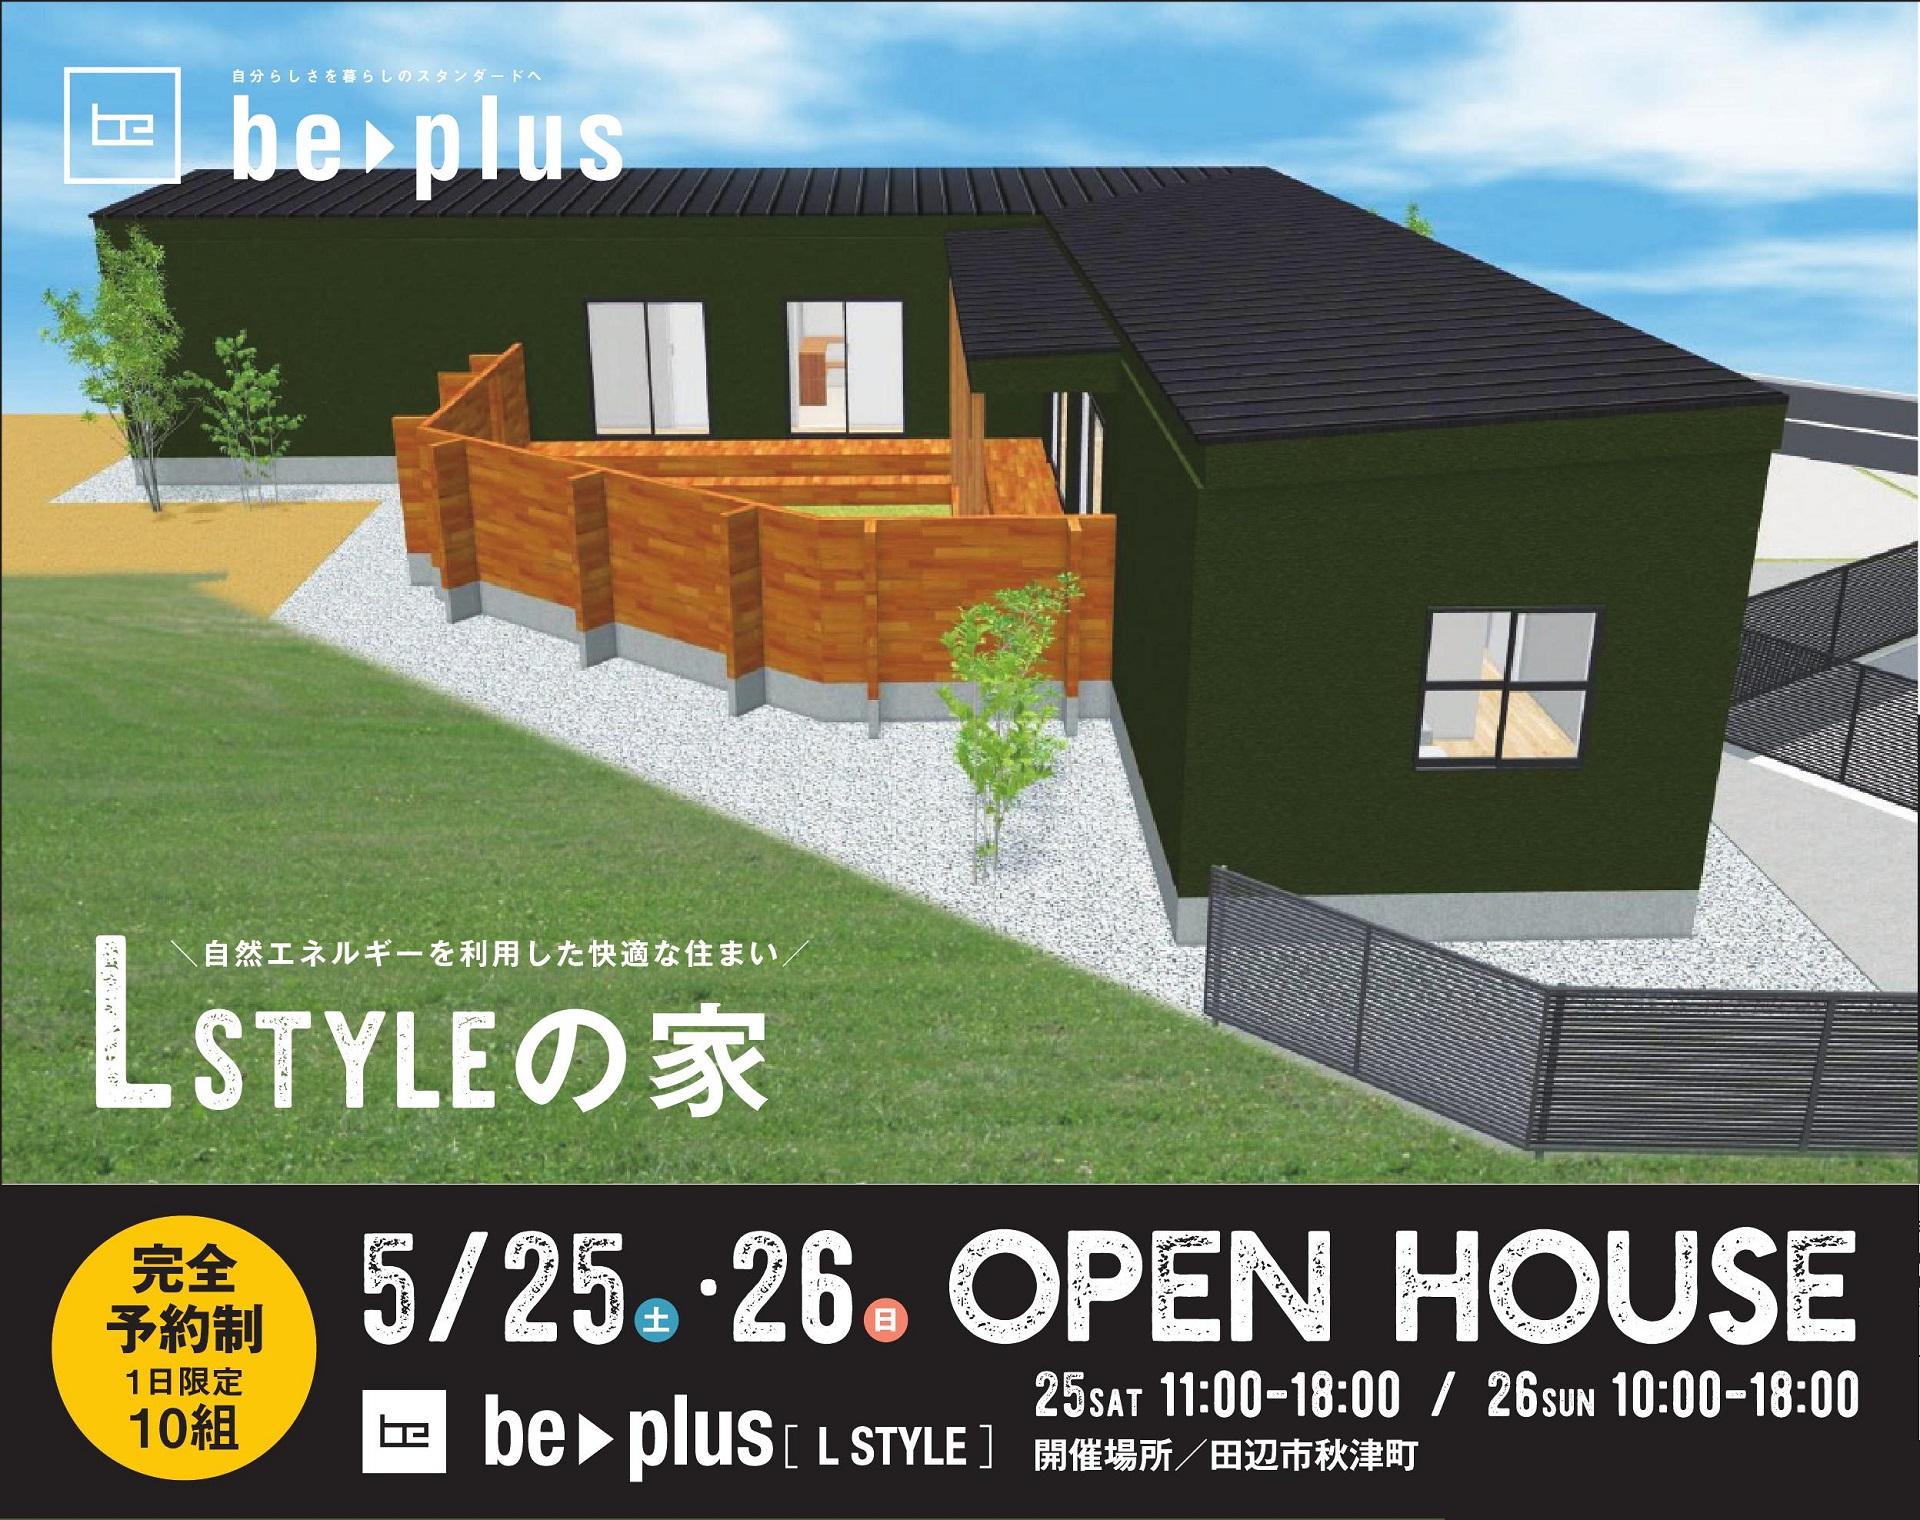 be>plus 第23棟目竣工記念見学会  at 田辺市秋津町